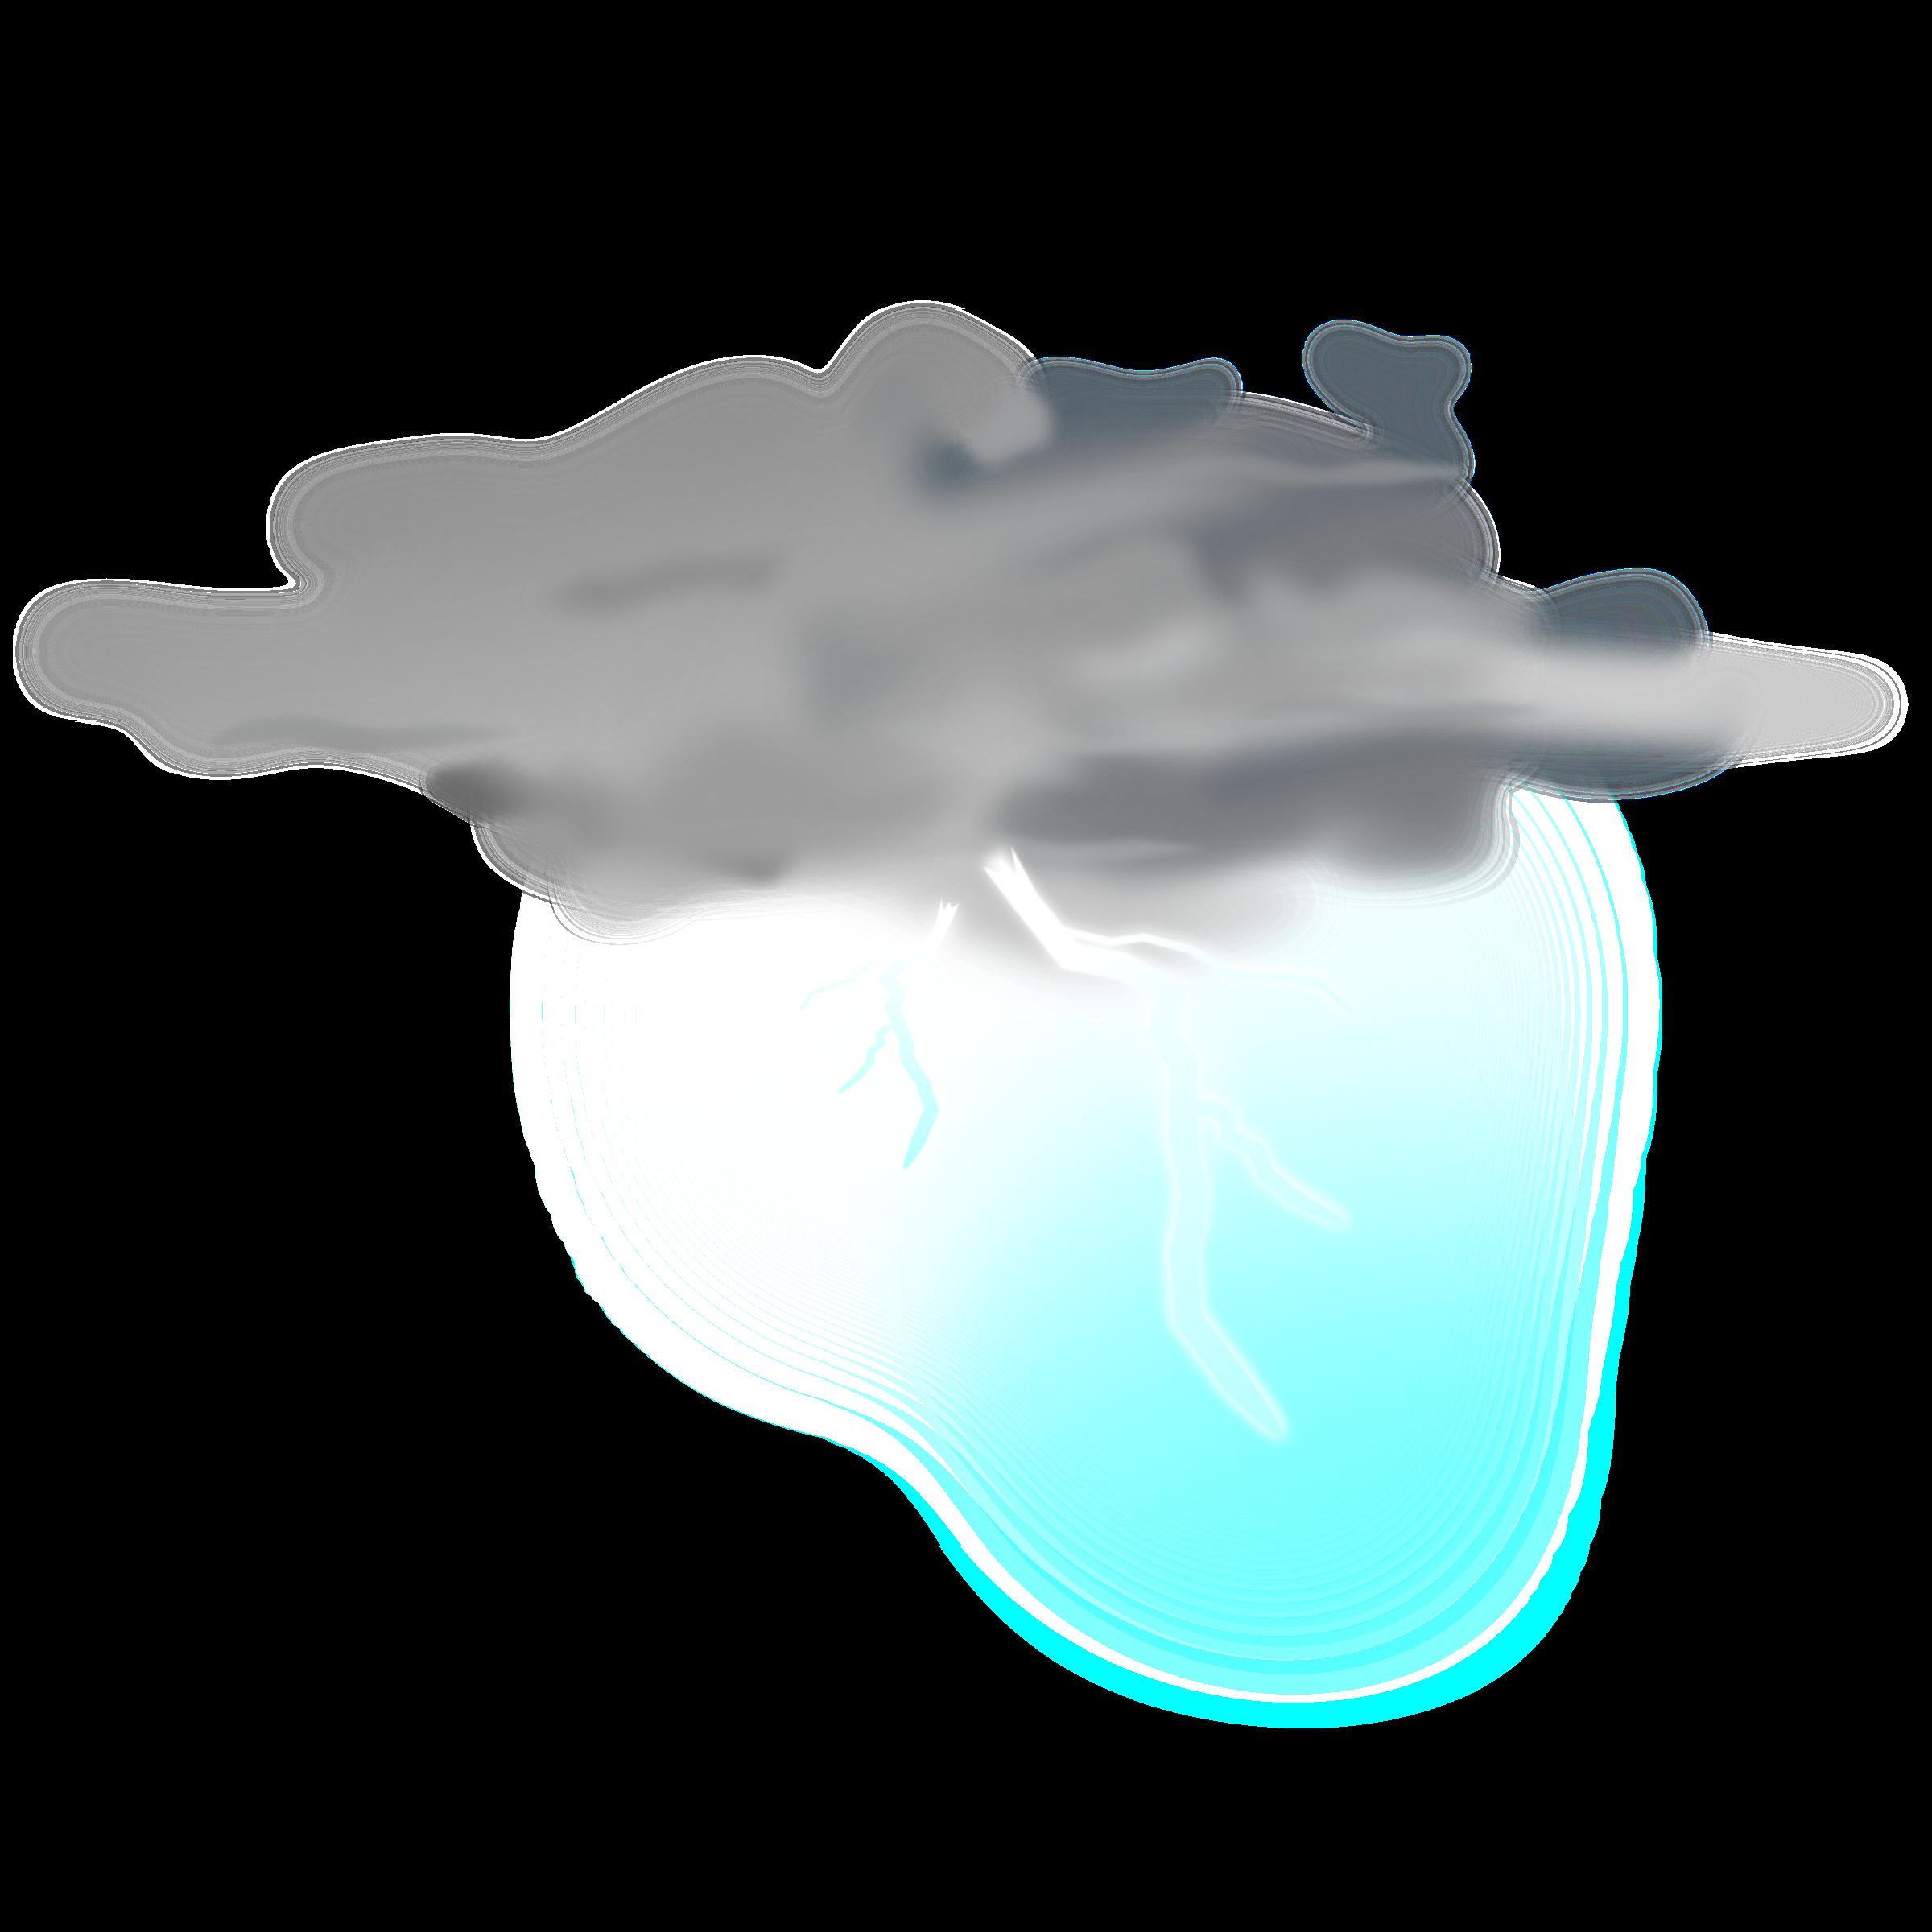 Thunderstorm clipart thunderstorm weather. Icon thunder big image